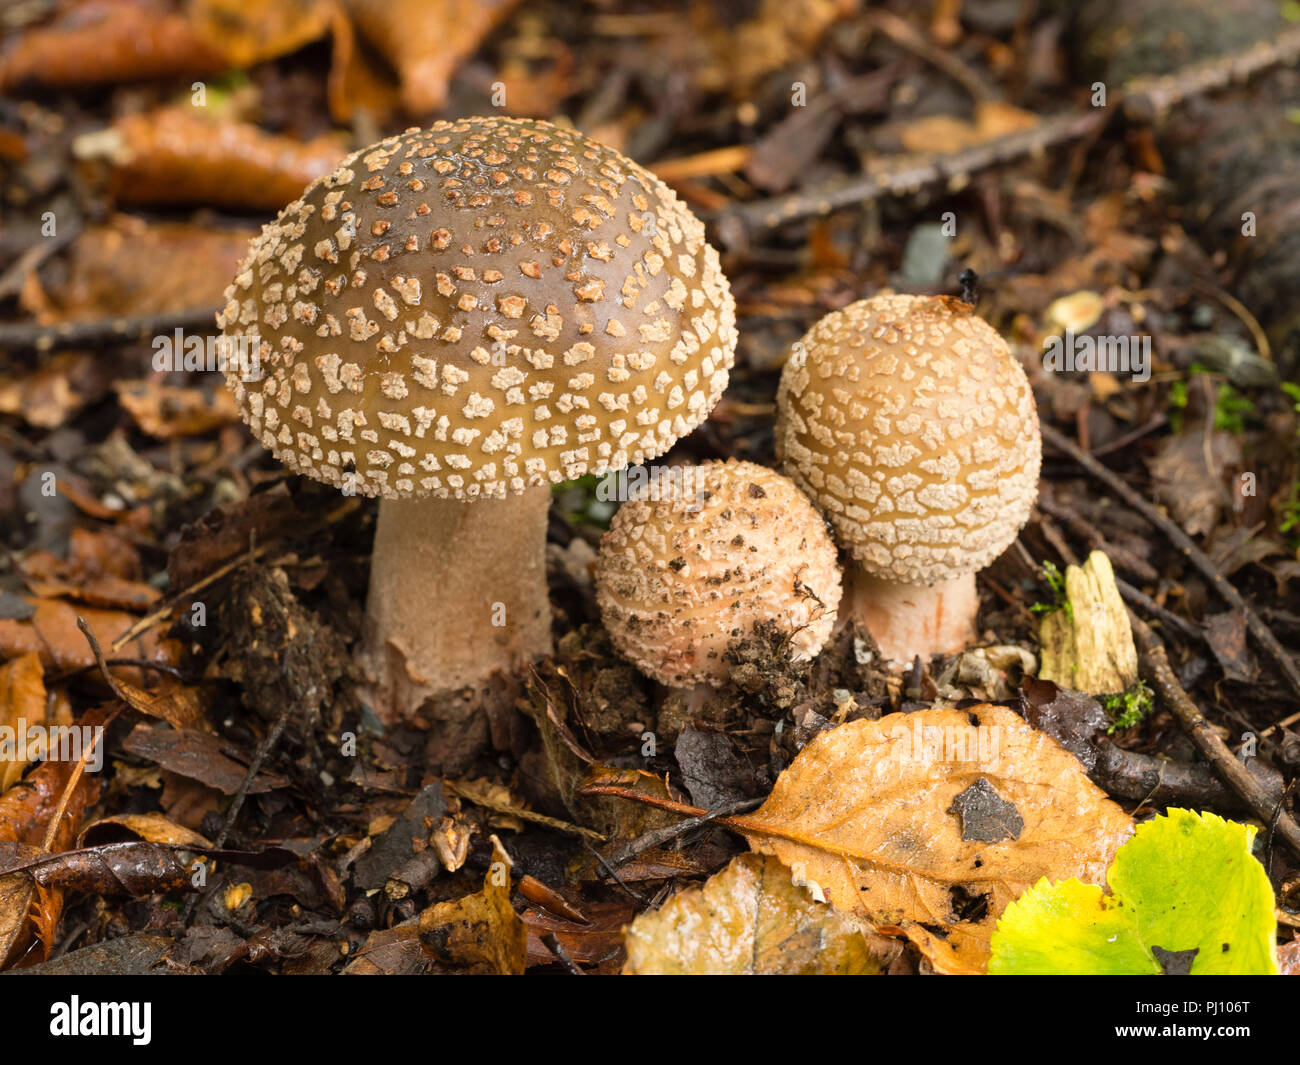 Freshly emerged fruiting bodies of the Blusher mushroom, Amanita rubescens, among birch leaf litter - Stock Image